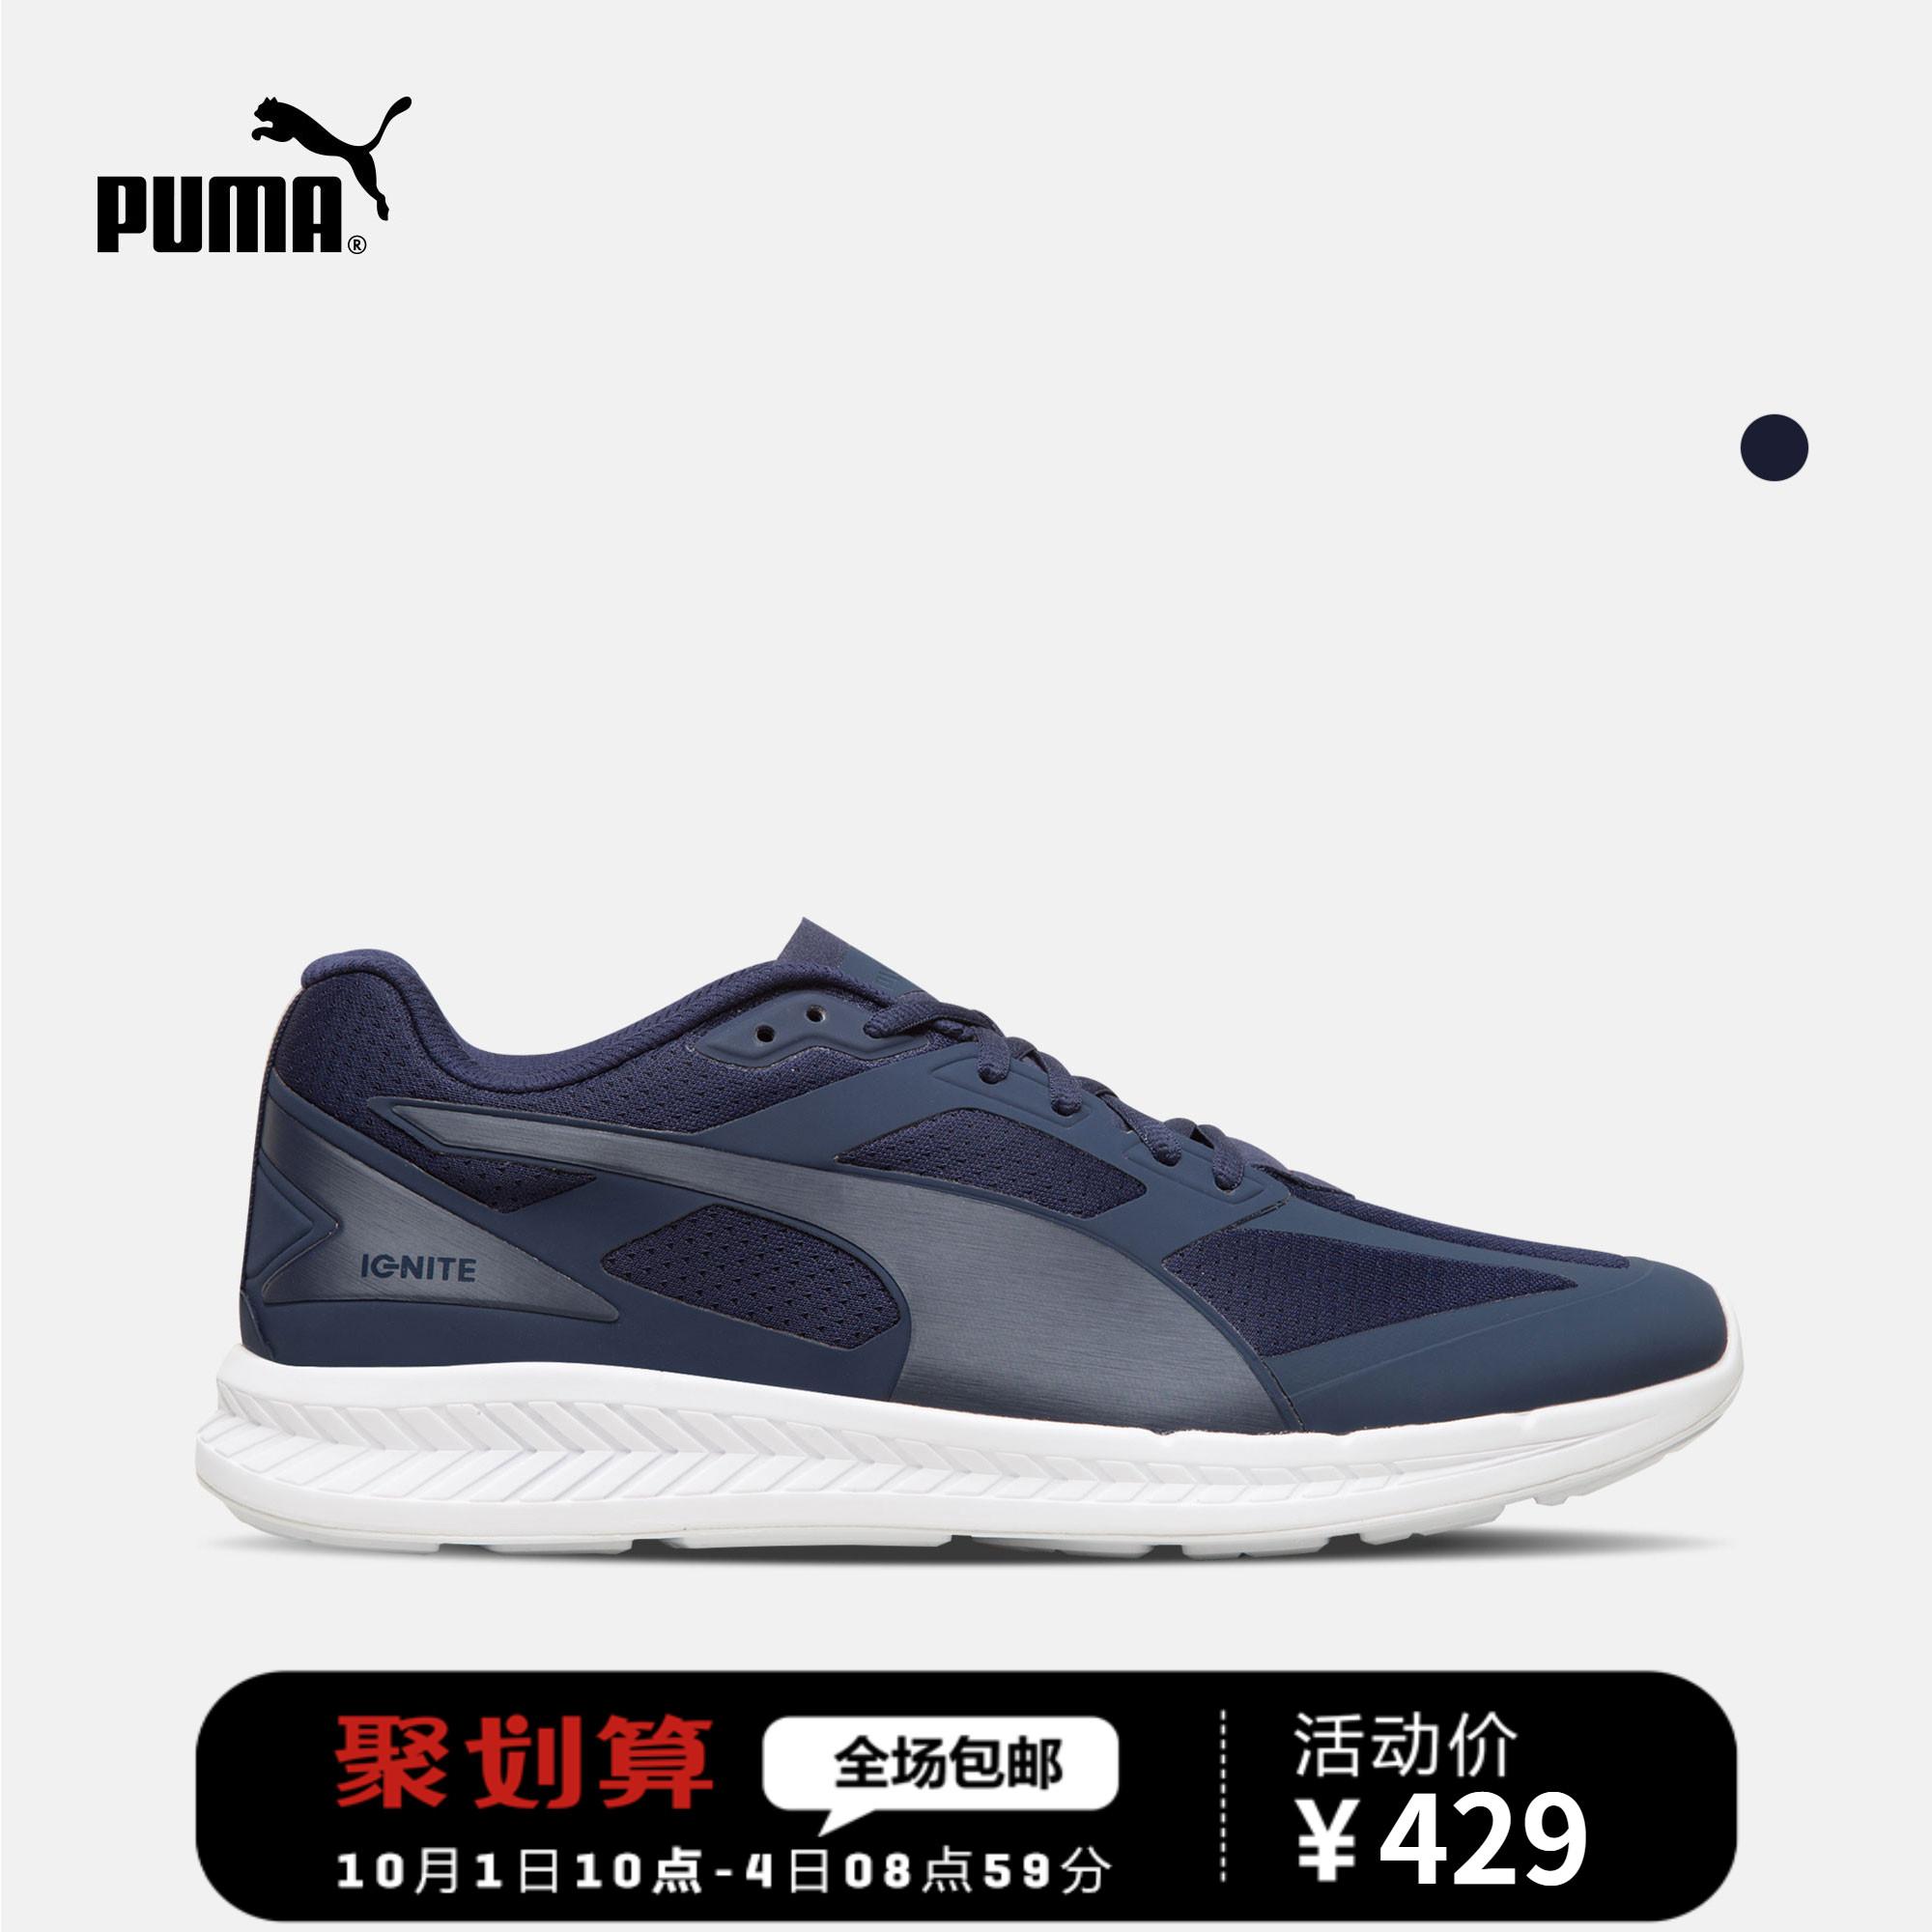 PUMA彪马官方 男女同款跑步鞋 IGNITE MO 190877